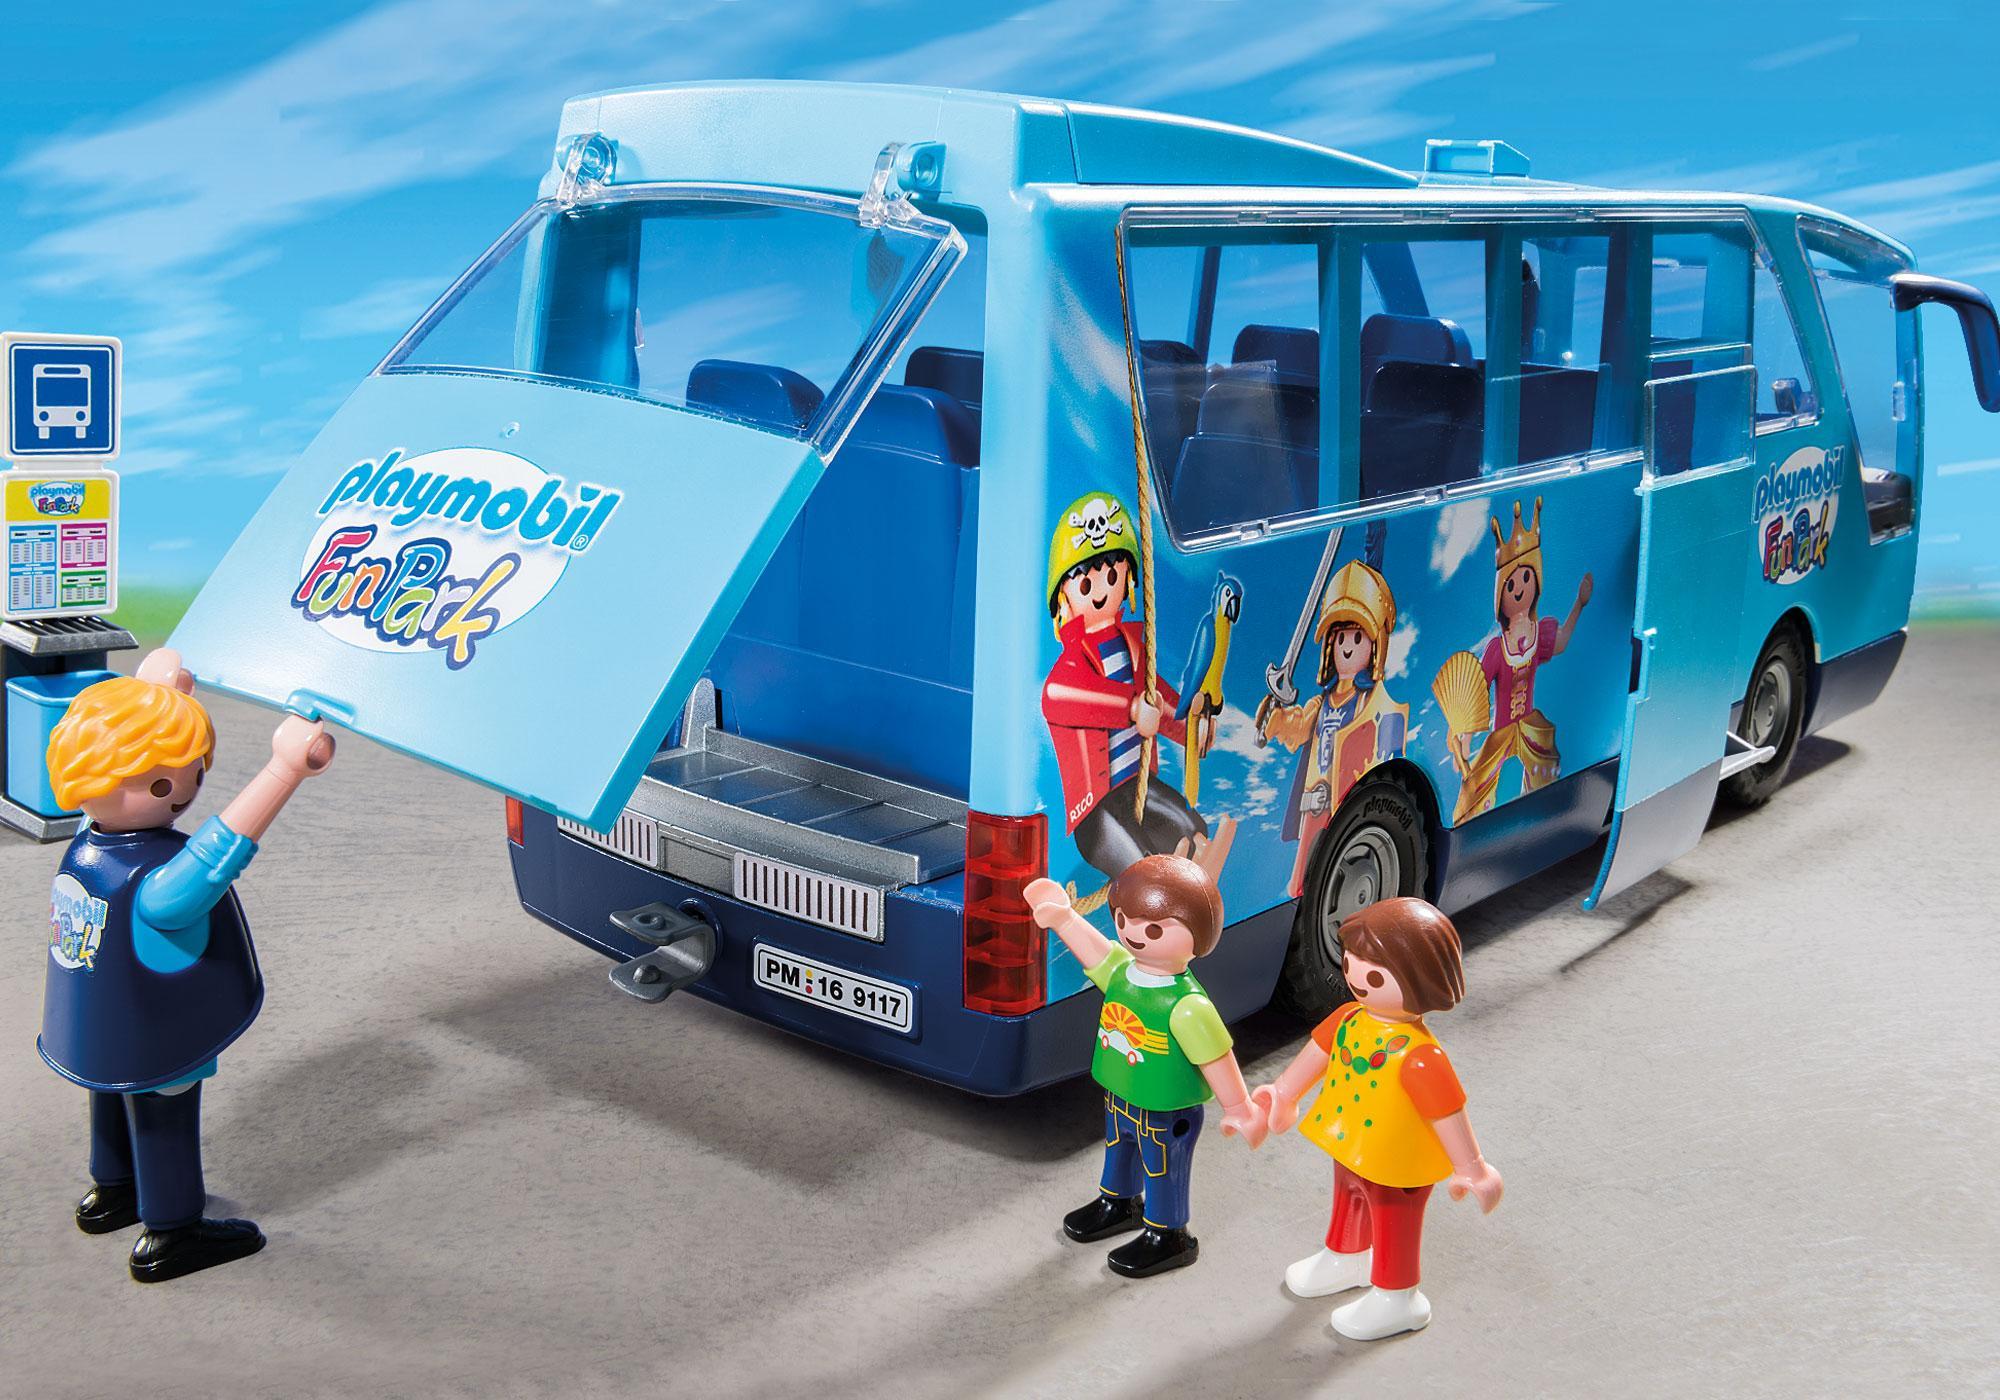 http://media.playmobil.com/i/playmobil/9117_product_extra3/PLAYMOBIL-FunPark Schulbus